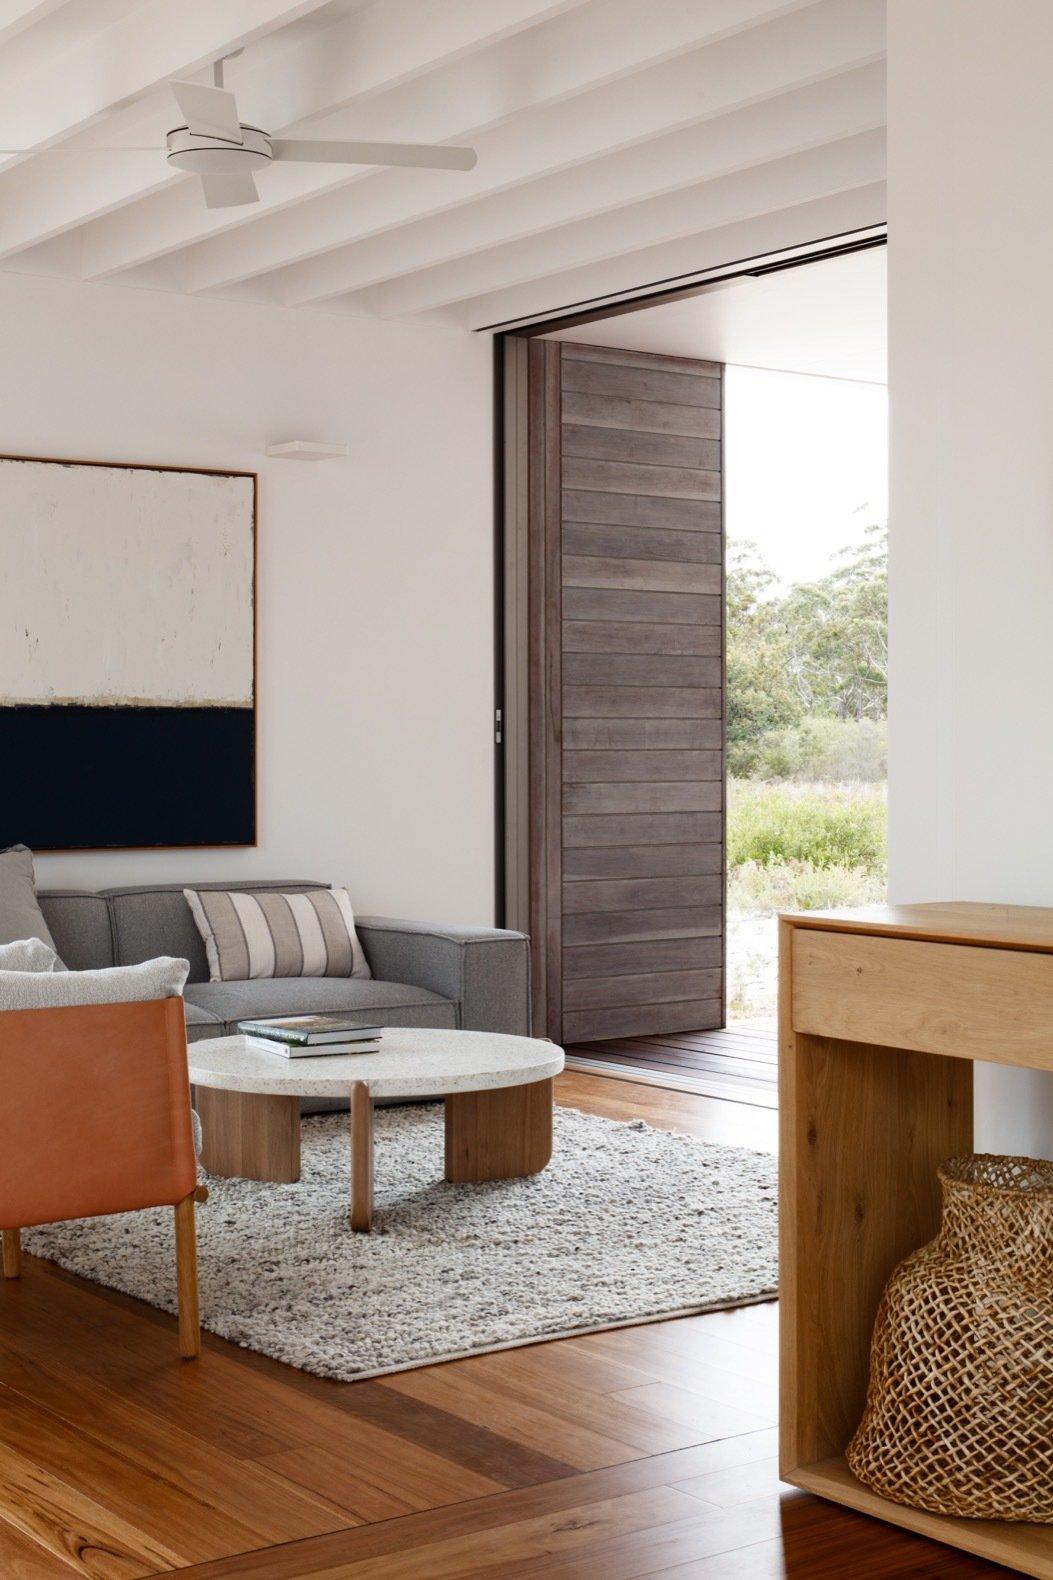 Living area of Courtyard House by CHROFI and FABPREFAB